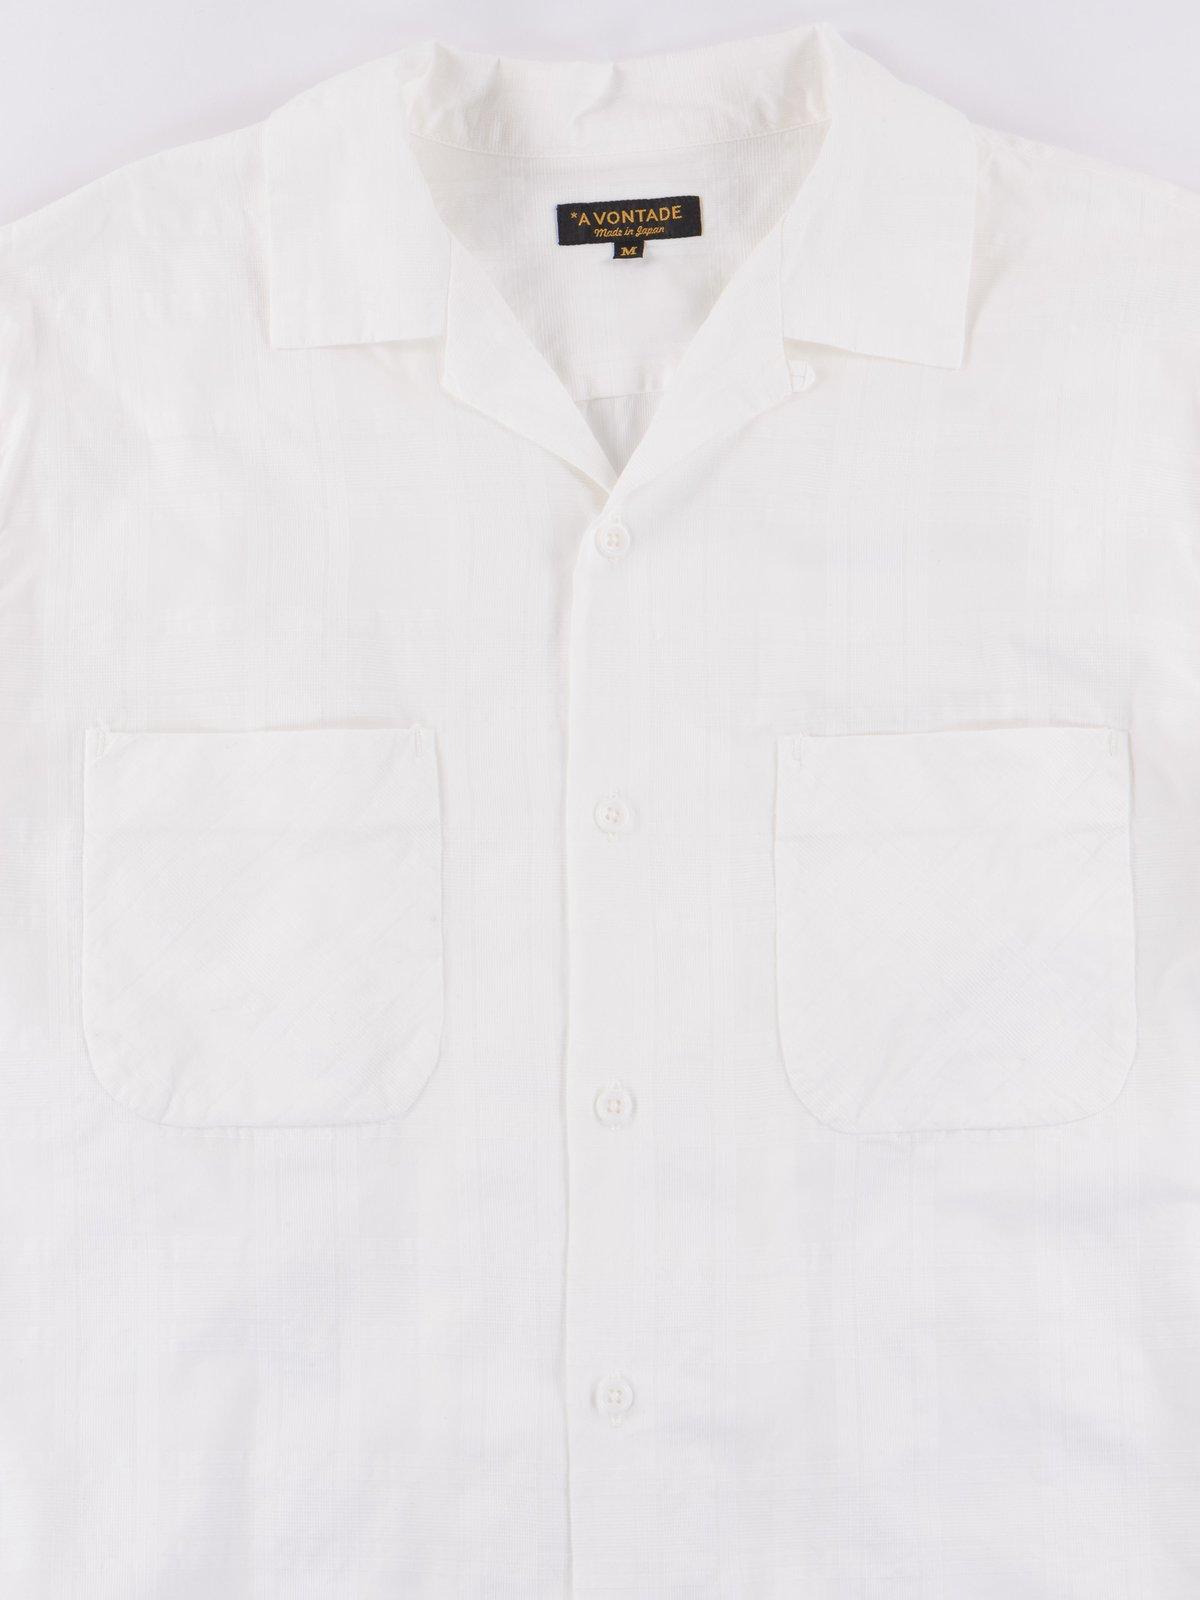 White Open SS Shirt - Image 2